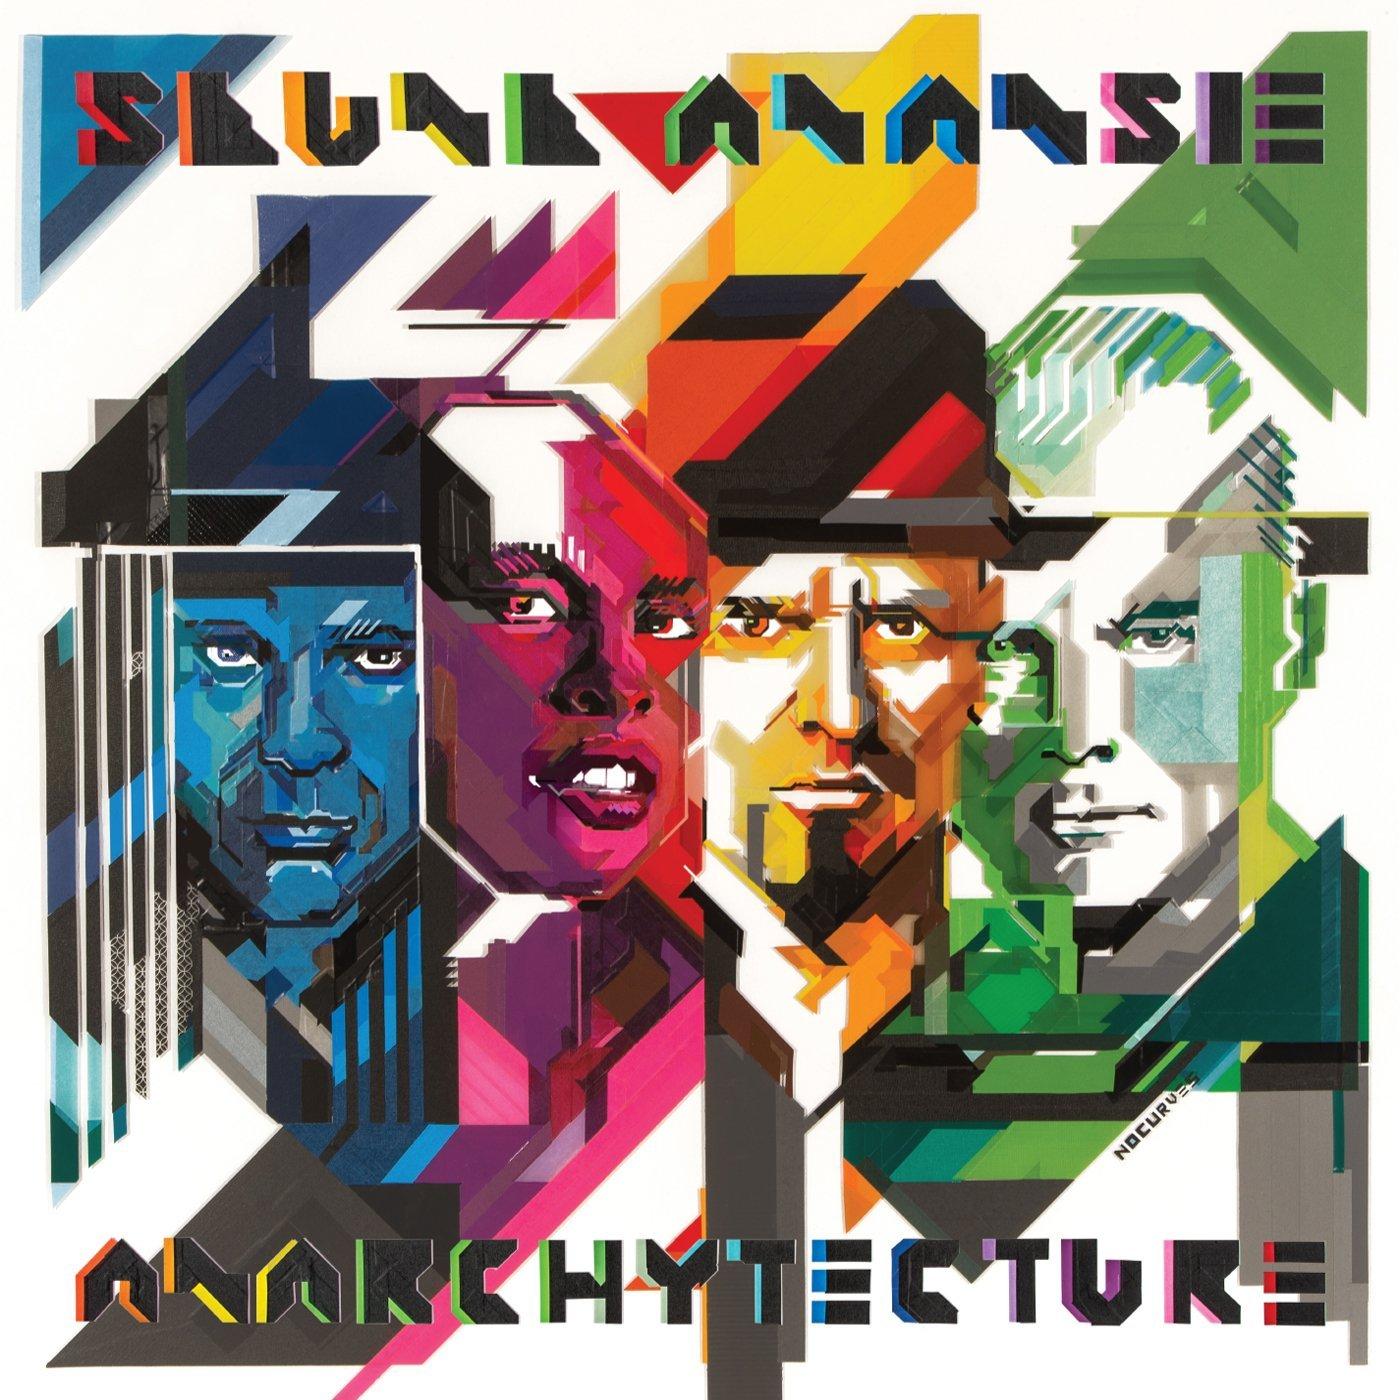 Skunk_anansie